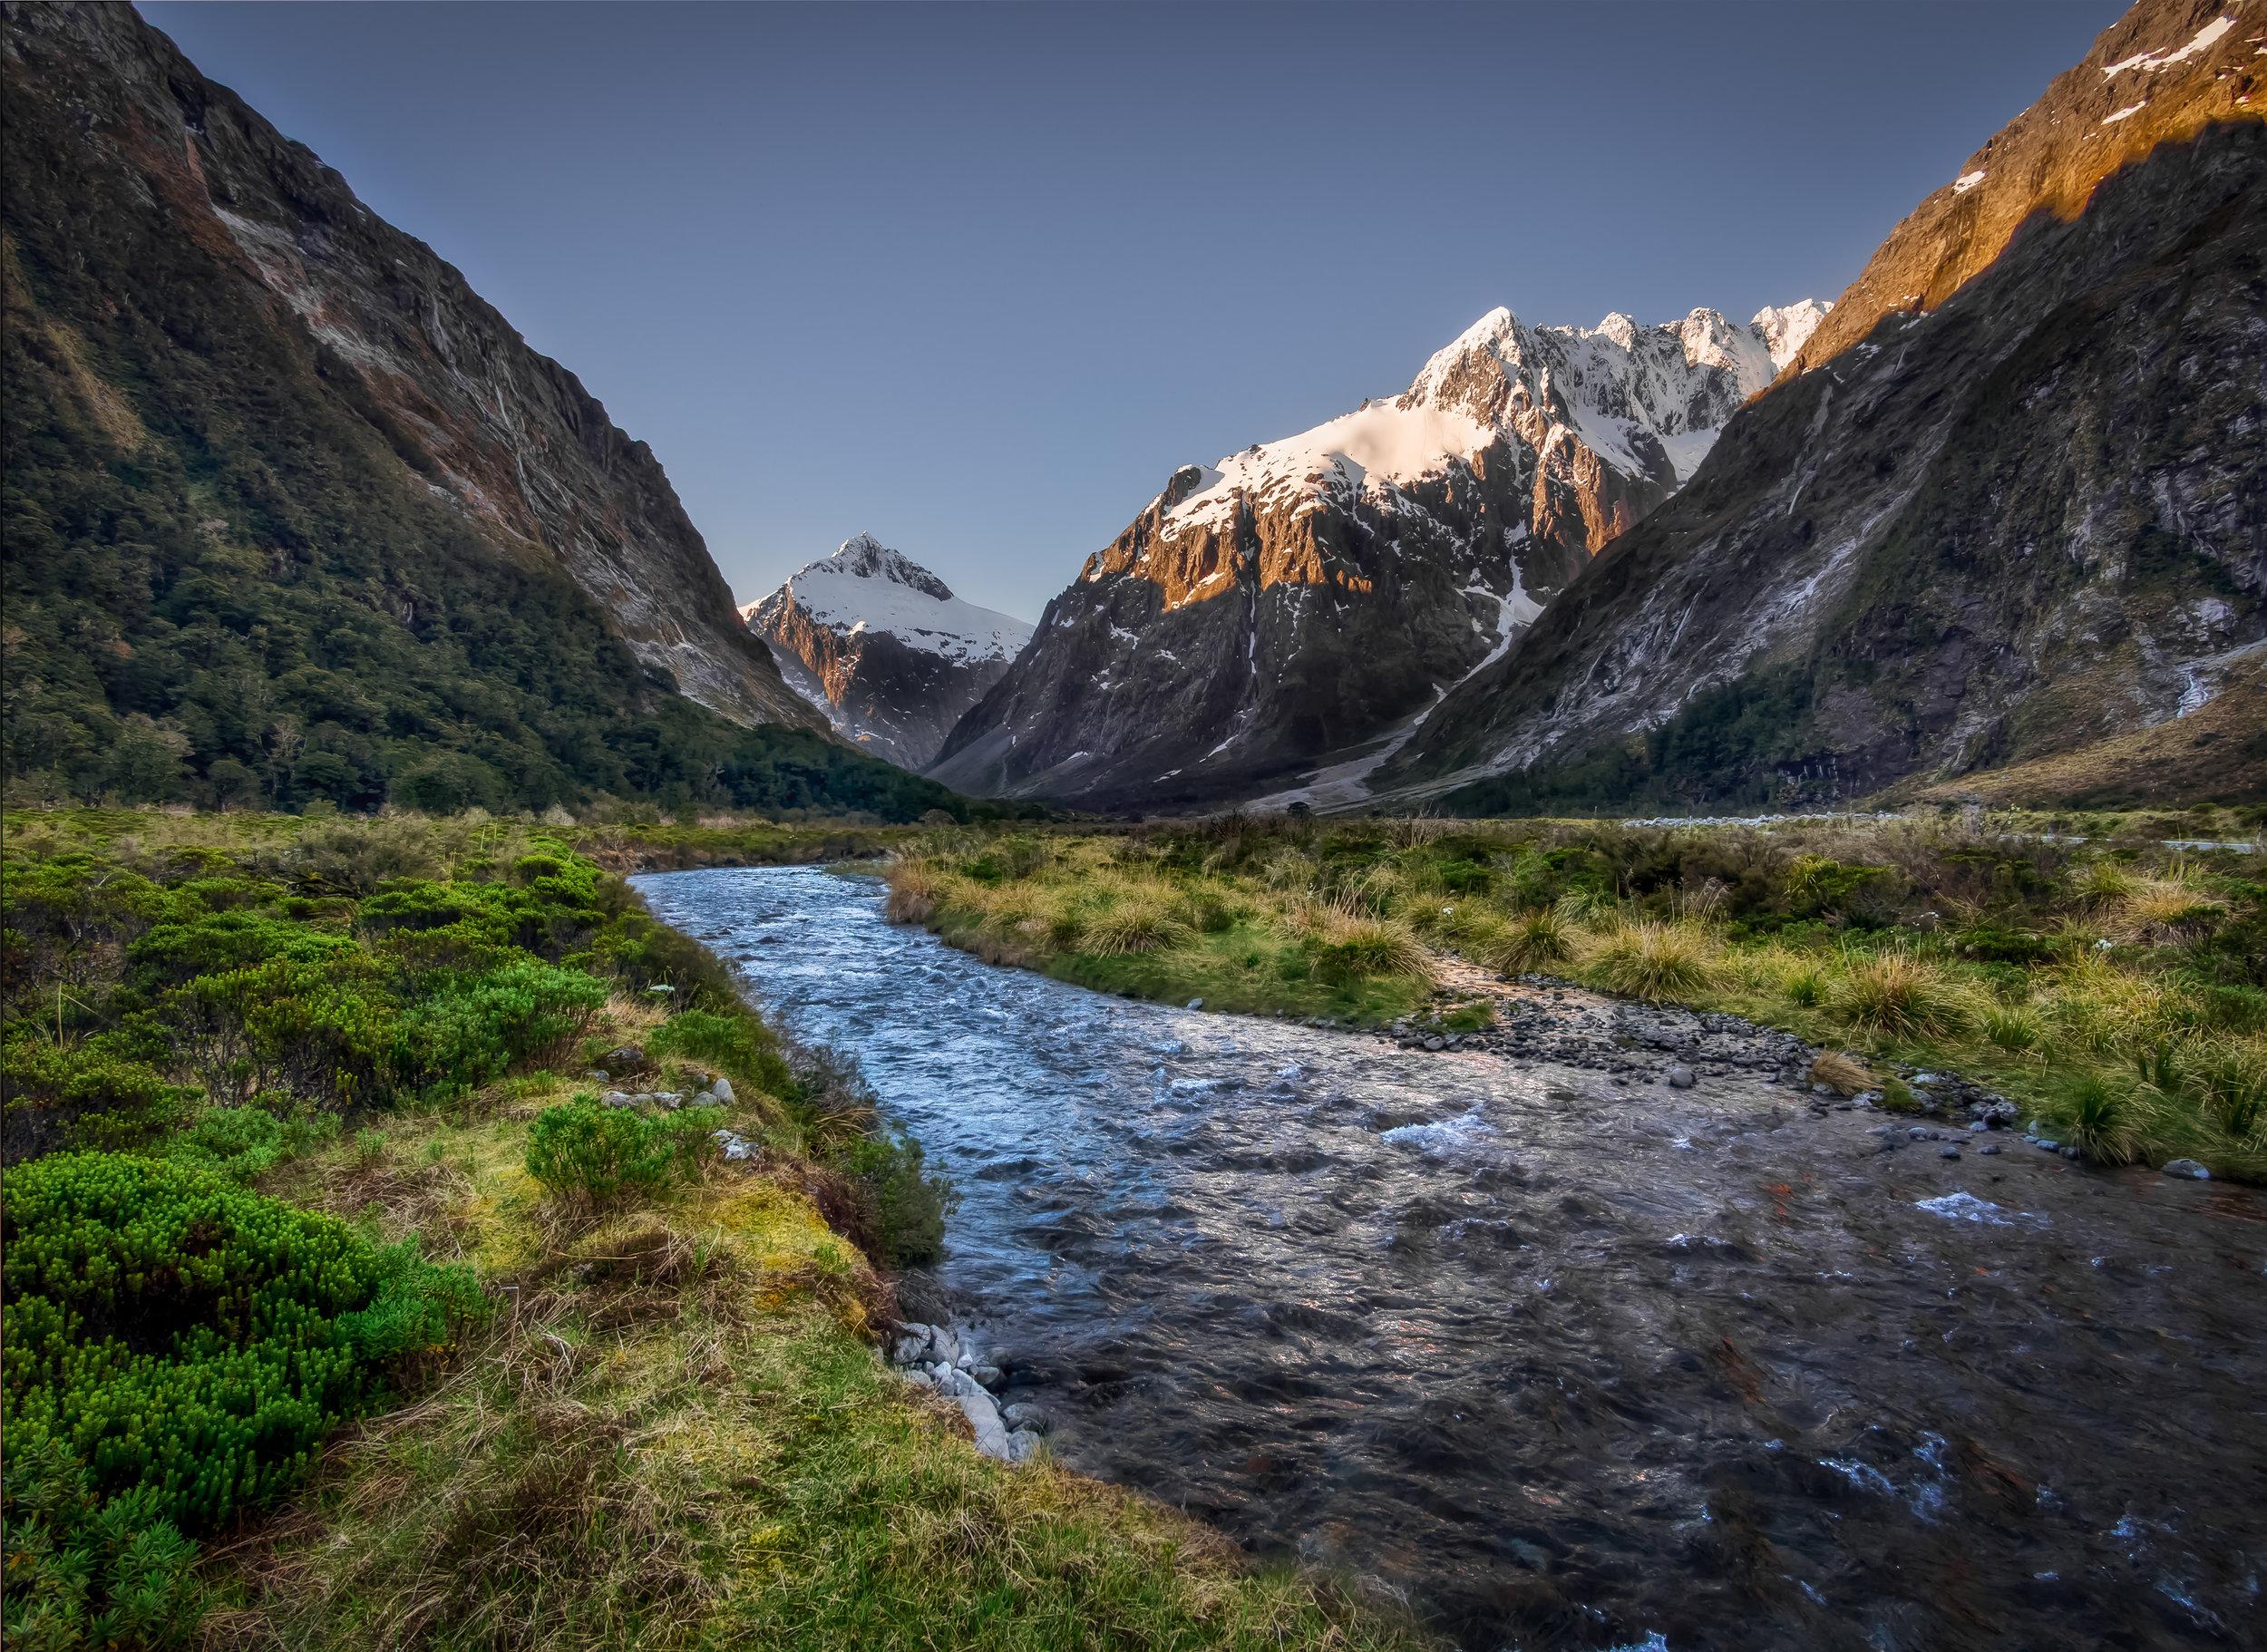 Monkey Creek at Milford Sound, Fiordland, New Zealand-4611 x 3458.jpg